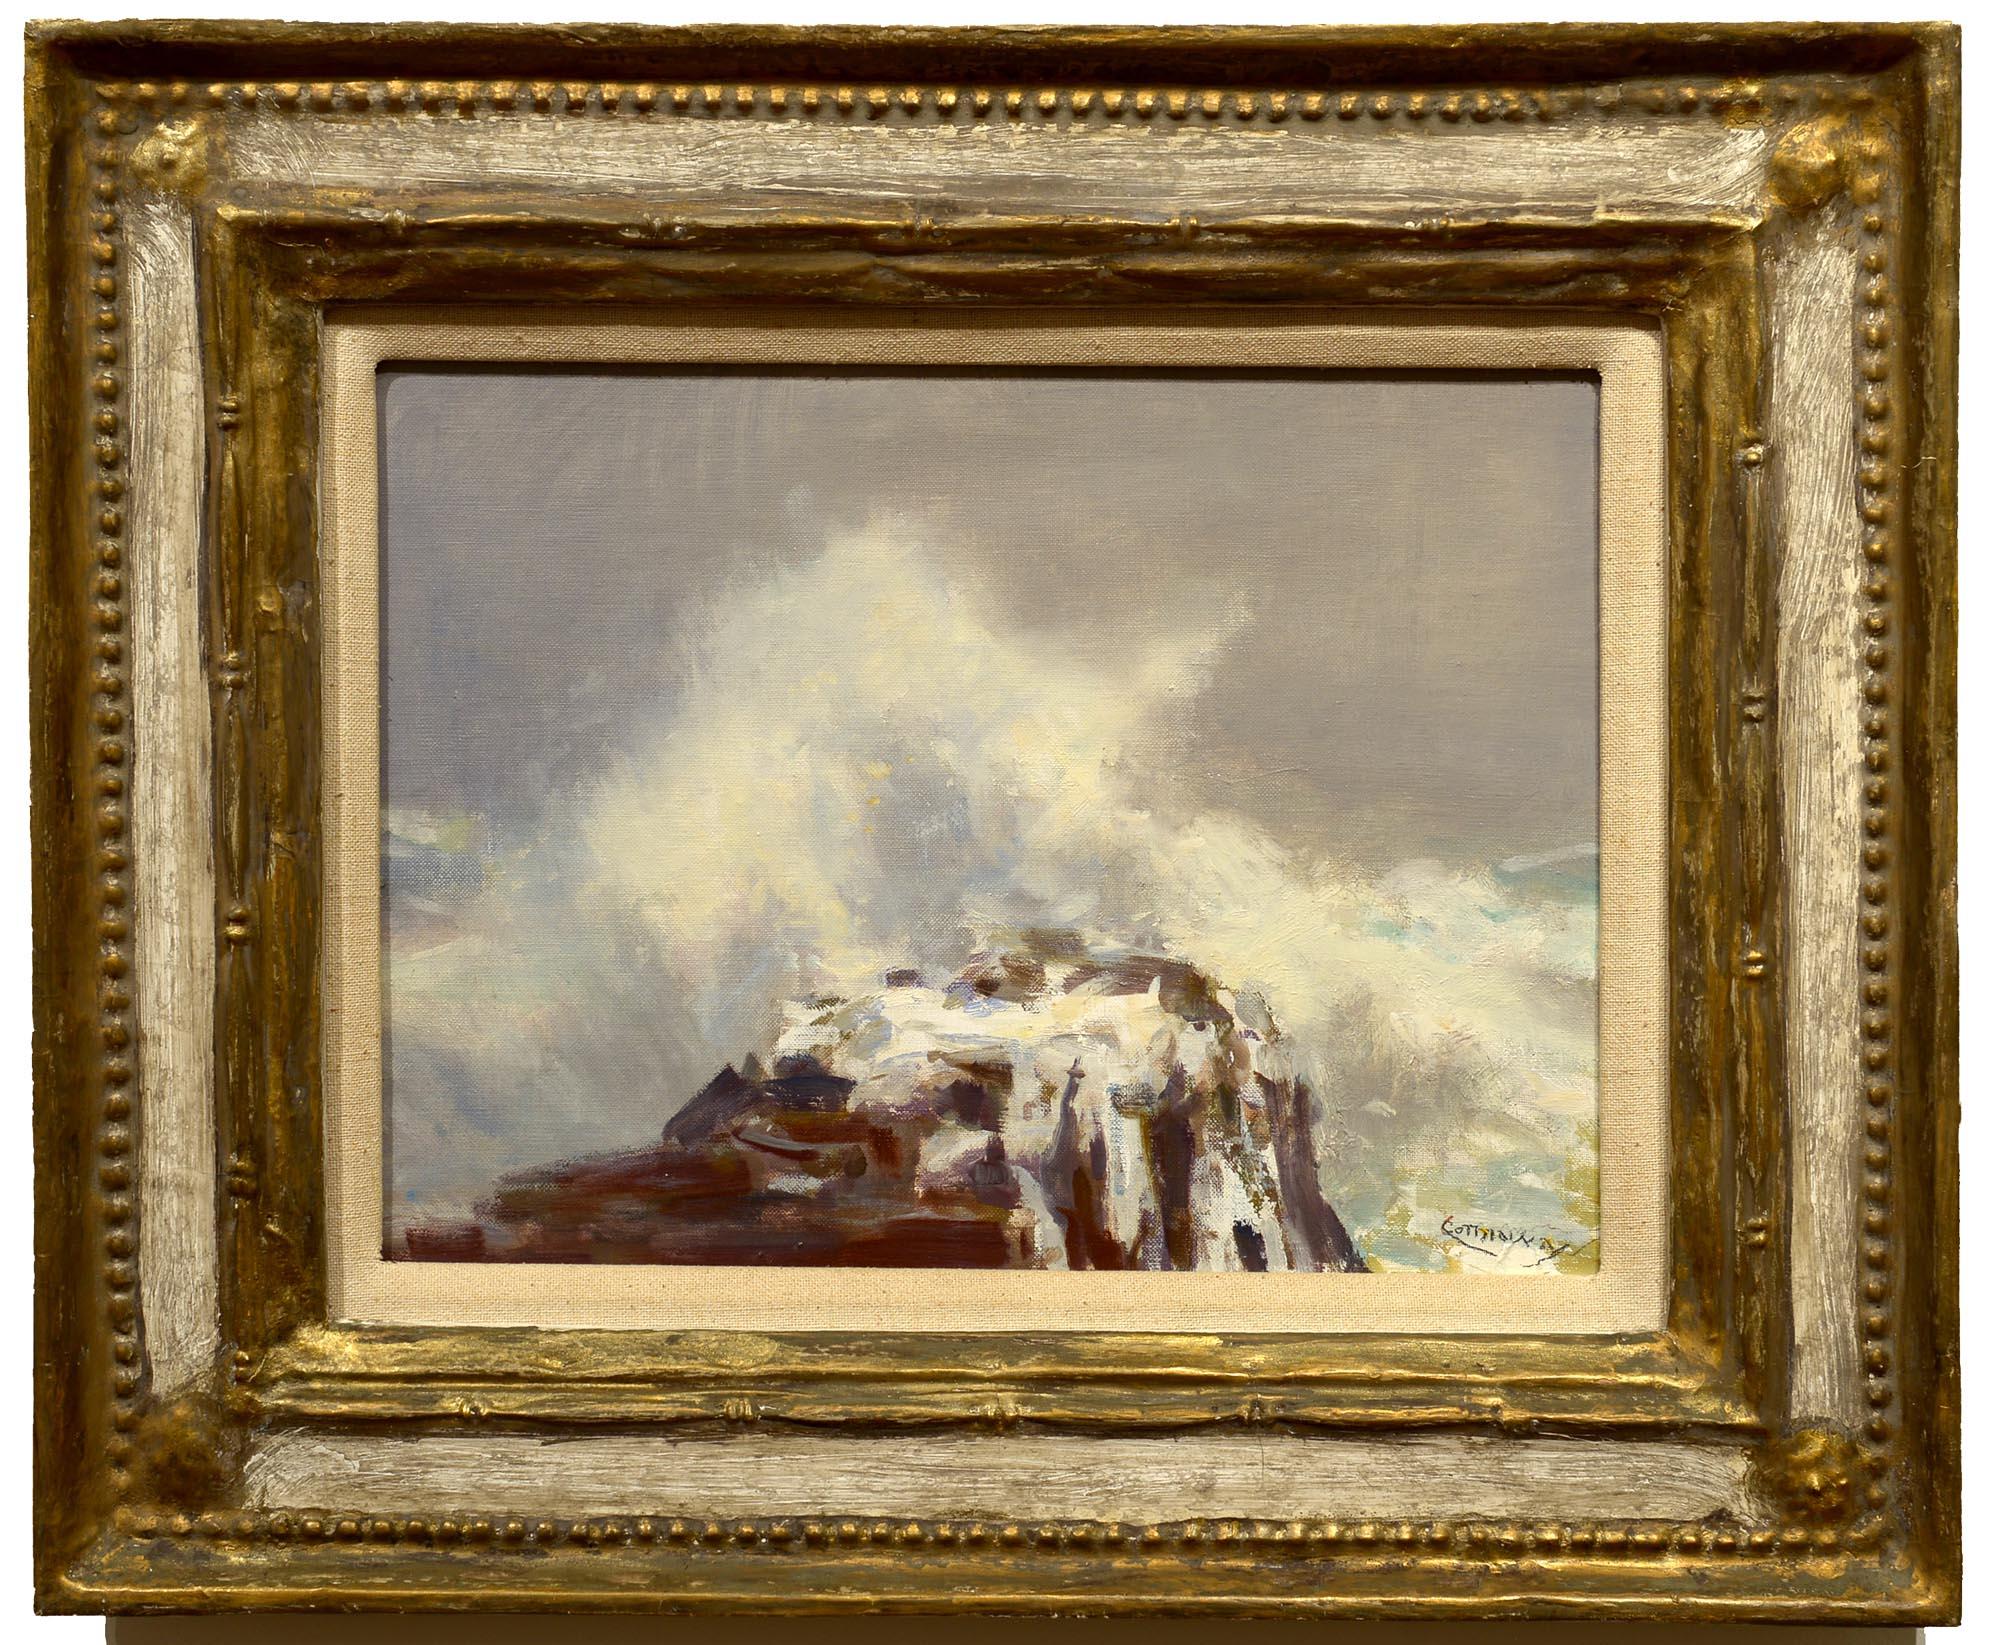 Jay Hall Connaway Sea Burst framed